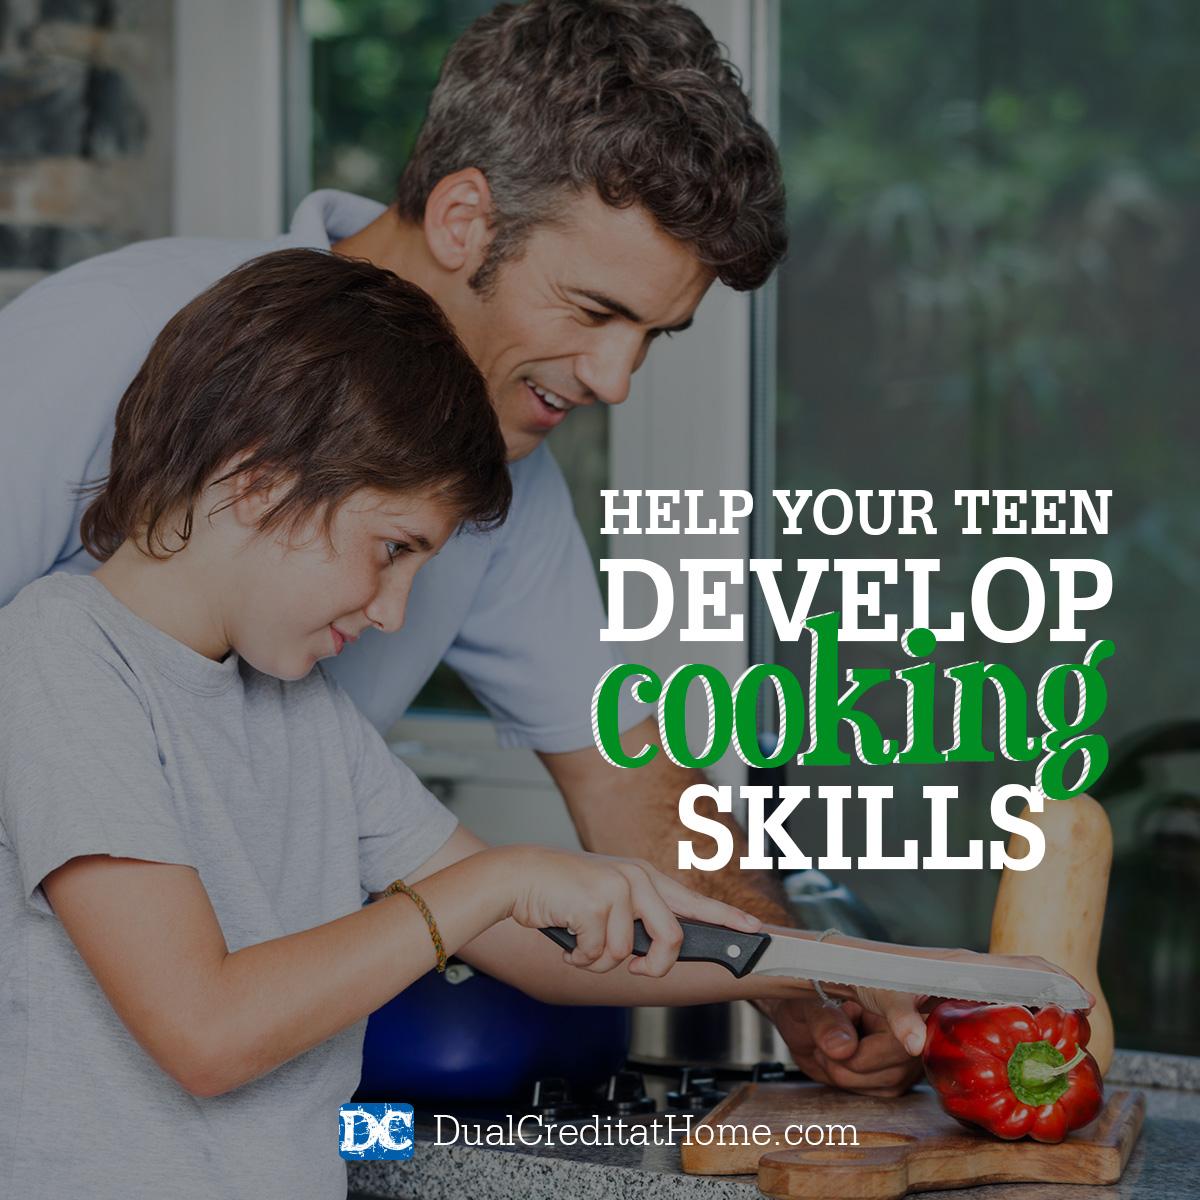 Help Your Teen Develop Cooking Skills